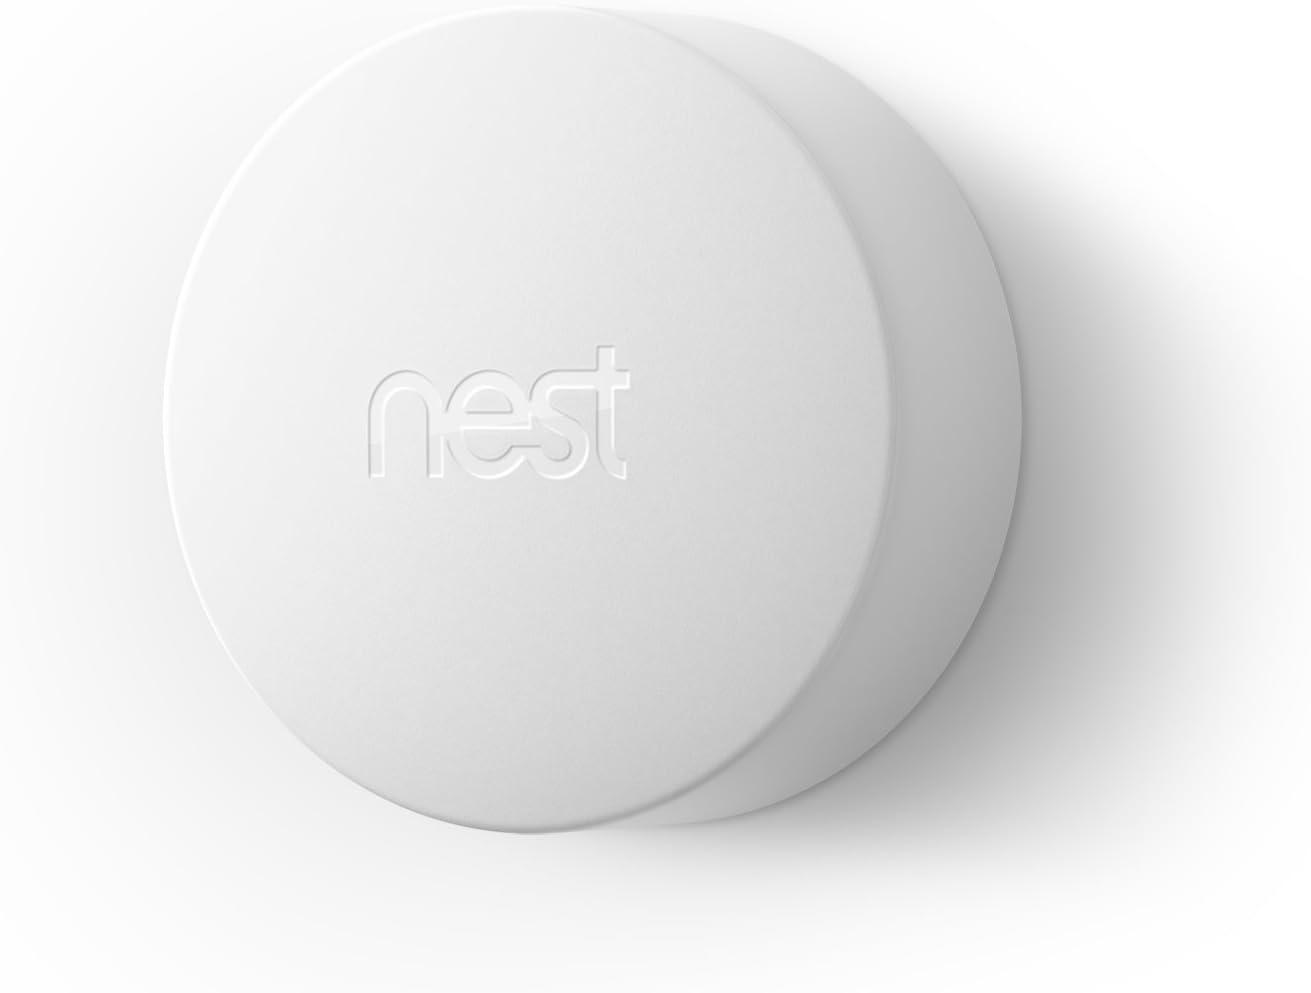 ORIGINAL ITEM Nest temperature sensor 3-pack for Nest Learning /& Thermostat E